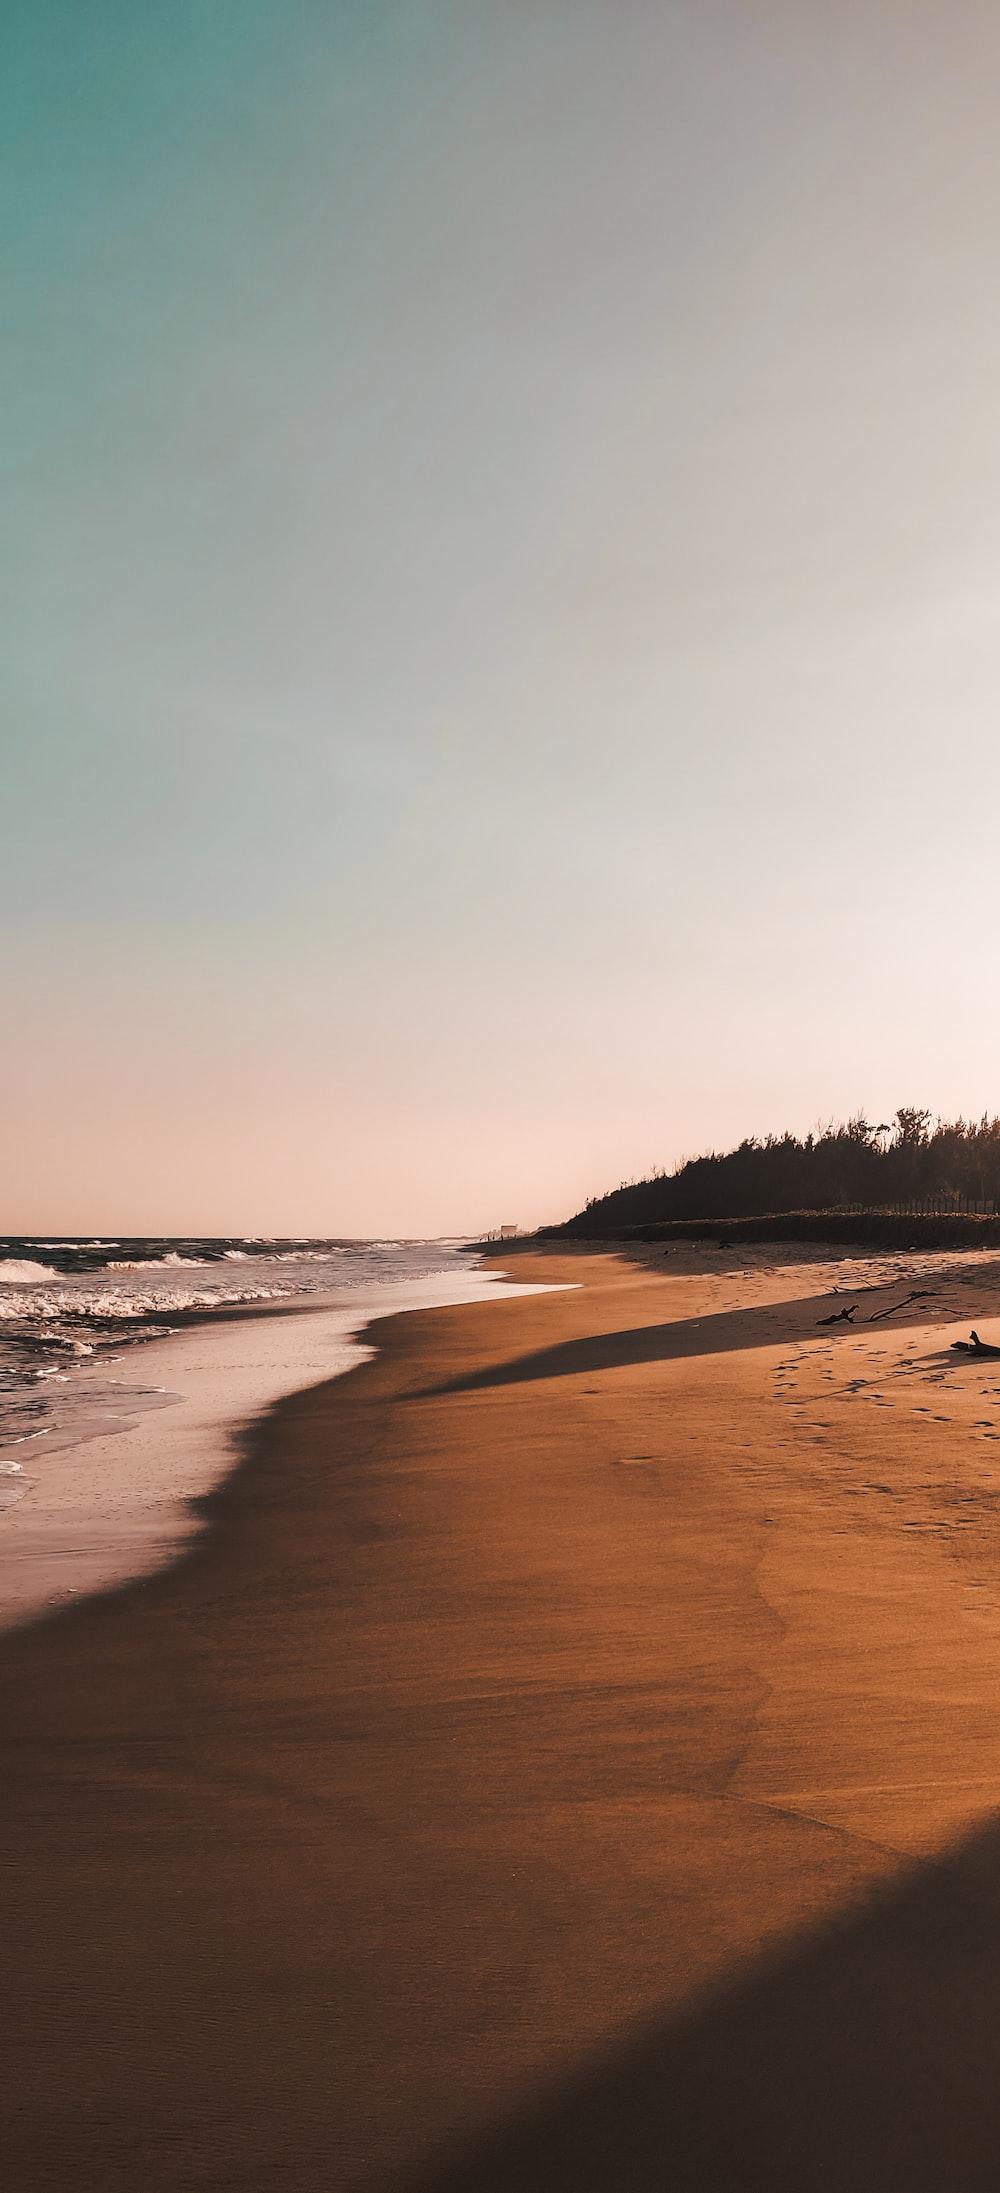 beach shore under gray sky